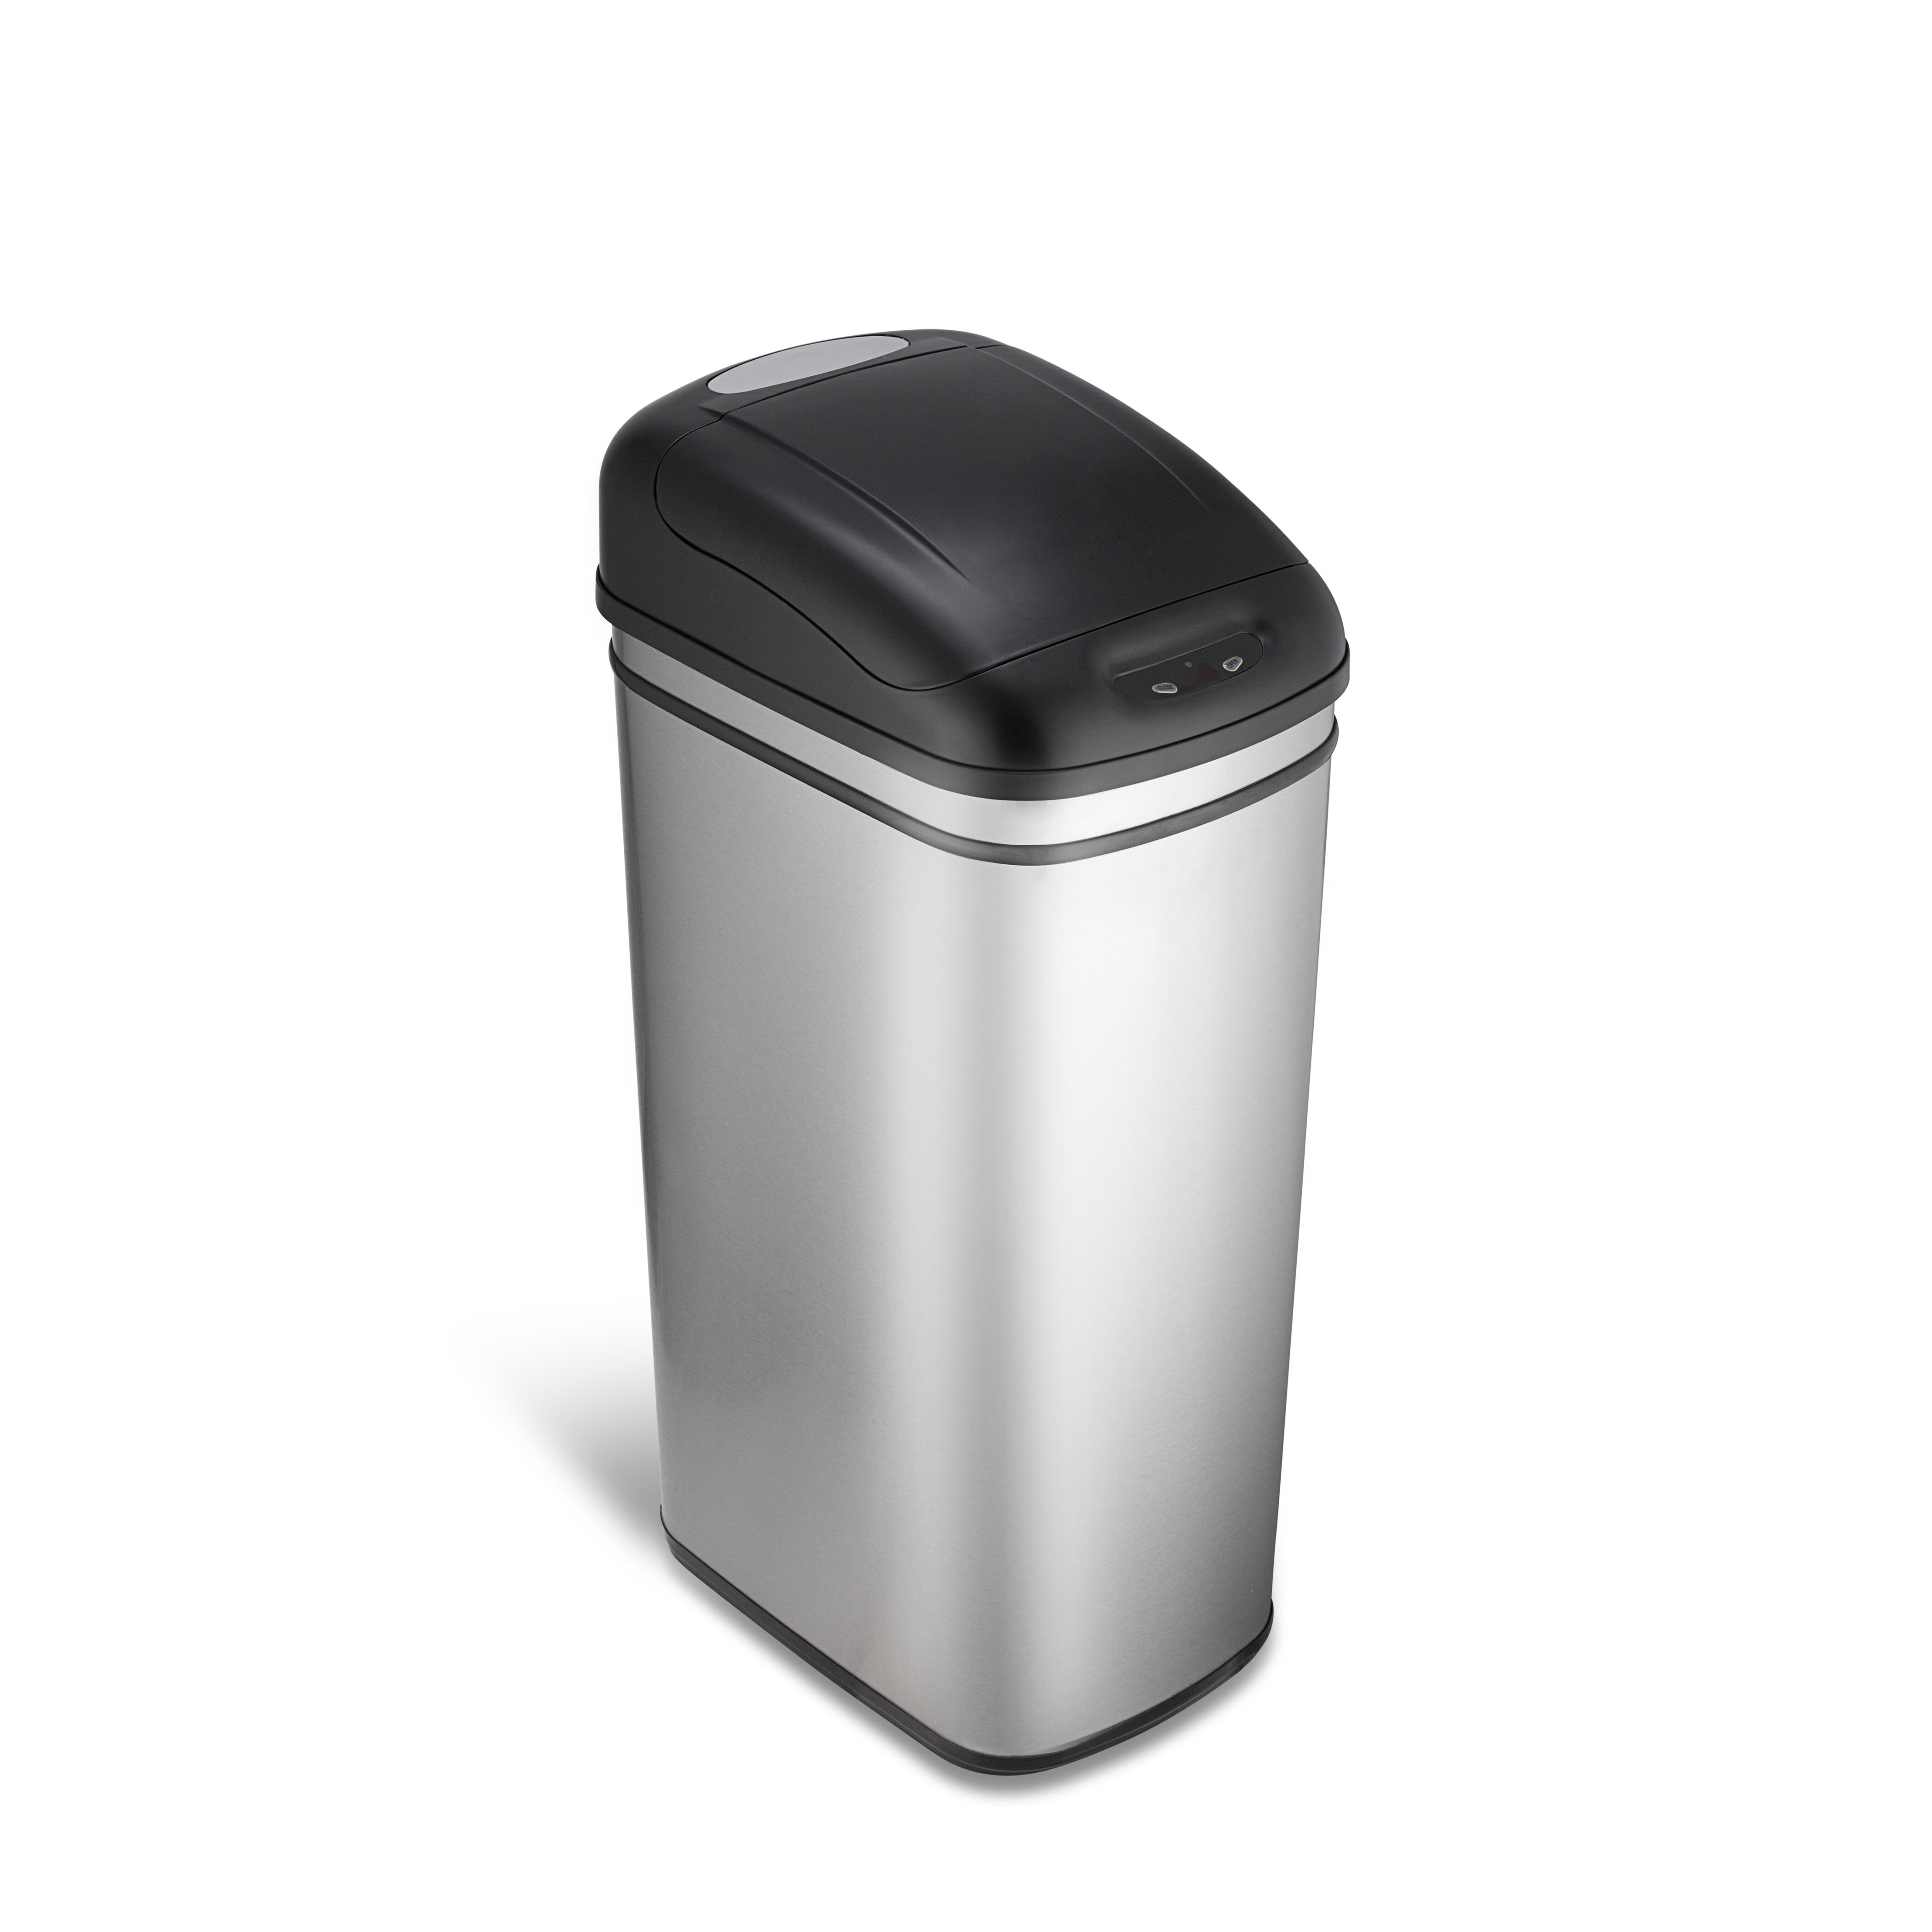 Stainless Steel 11 Gallon Motion Sensor Trash Can